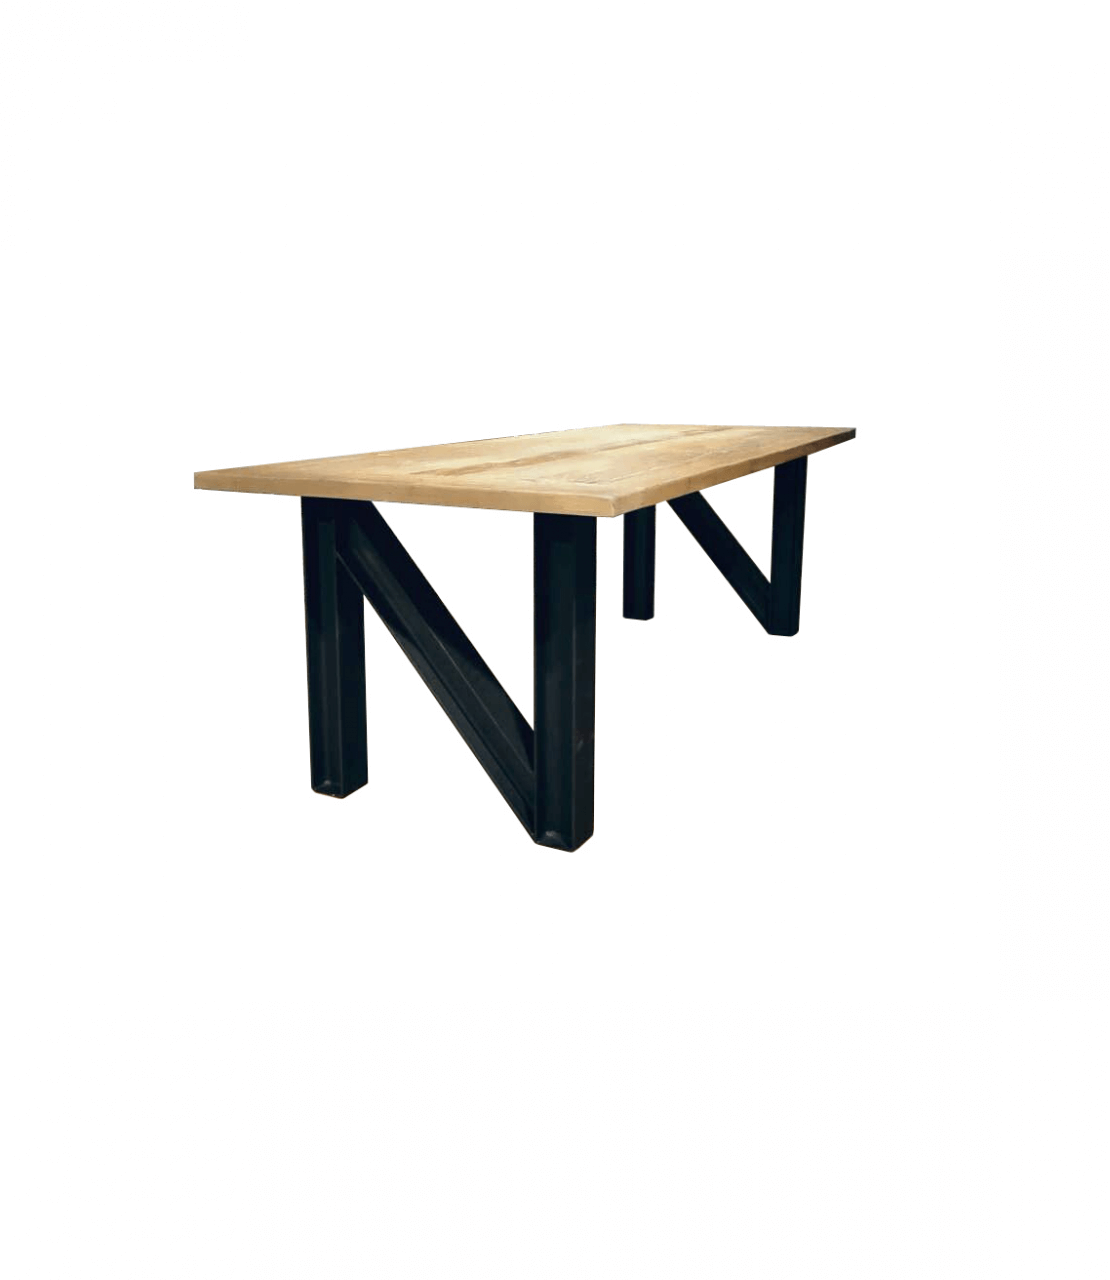 Stalen tafel N-frame stalen frame houten blad